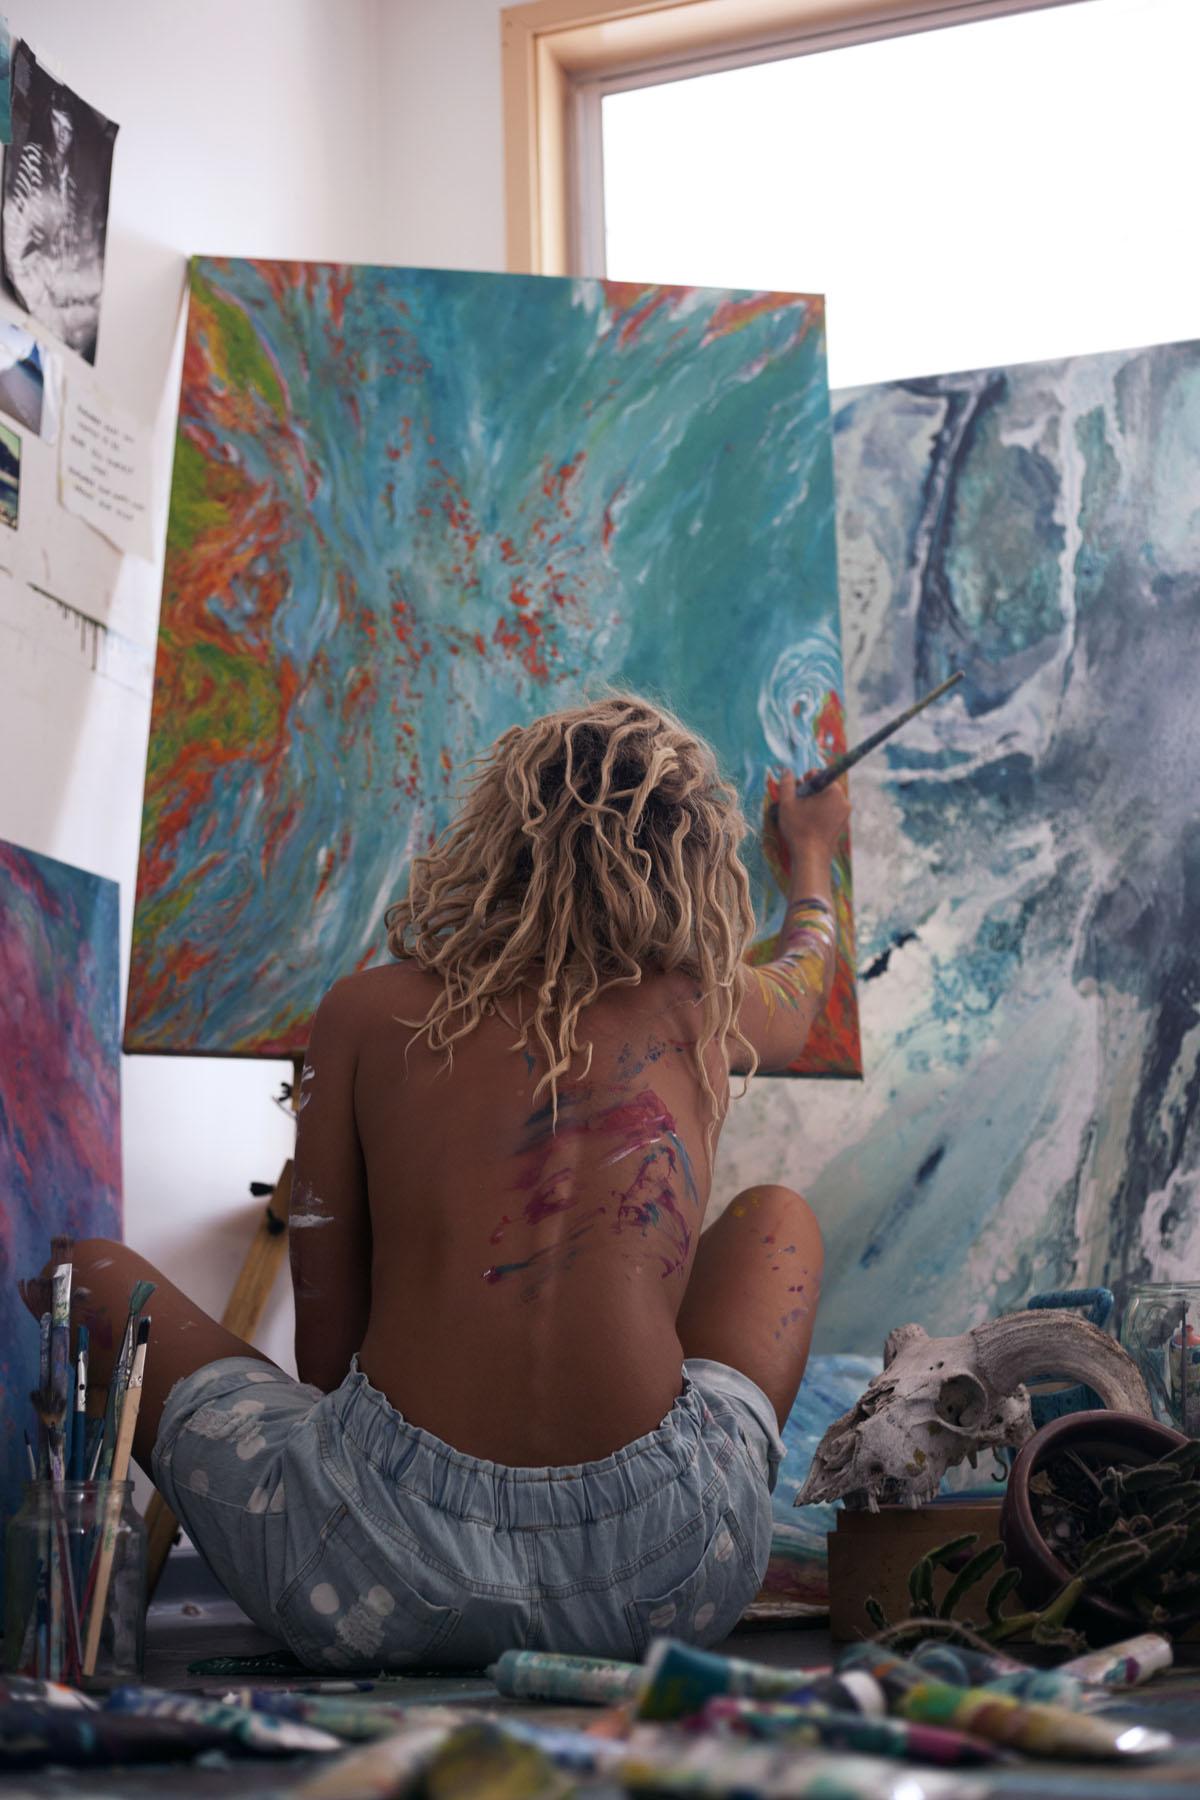 coypright-2015-ART-NIGHTS-by-Dani-Odgers-x-C-Heads-9